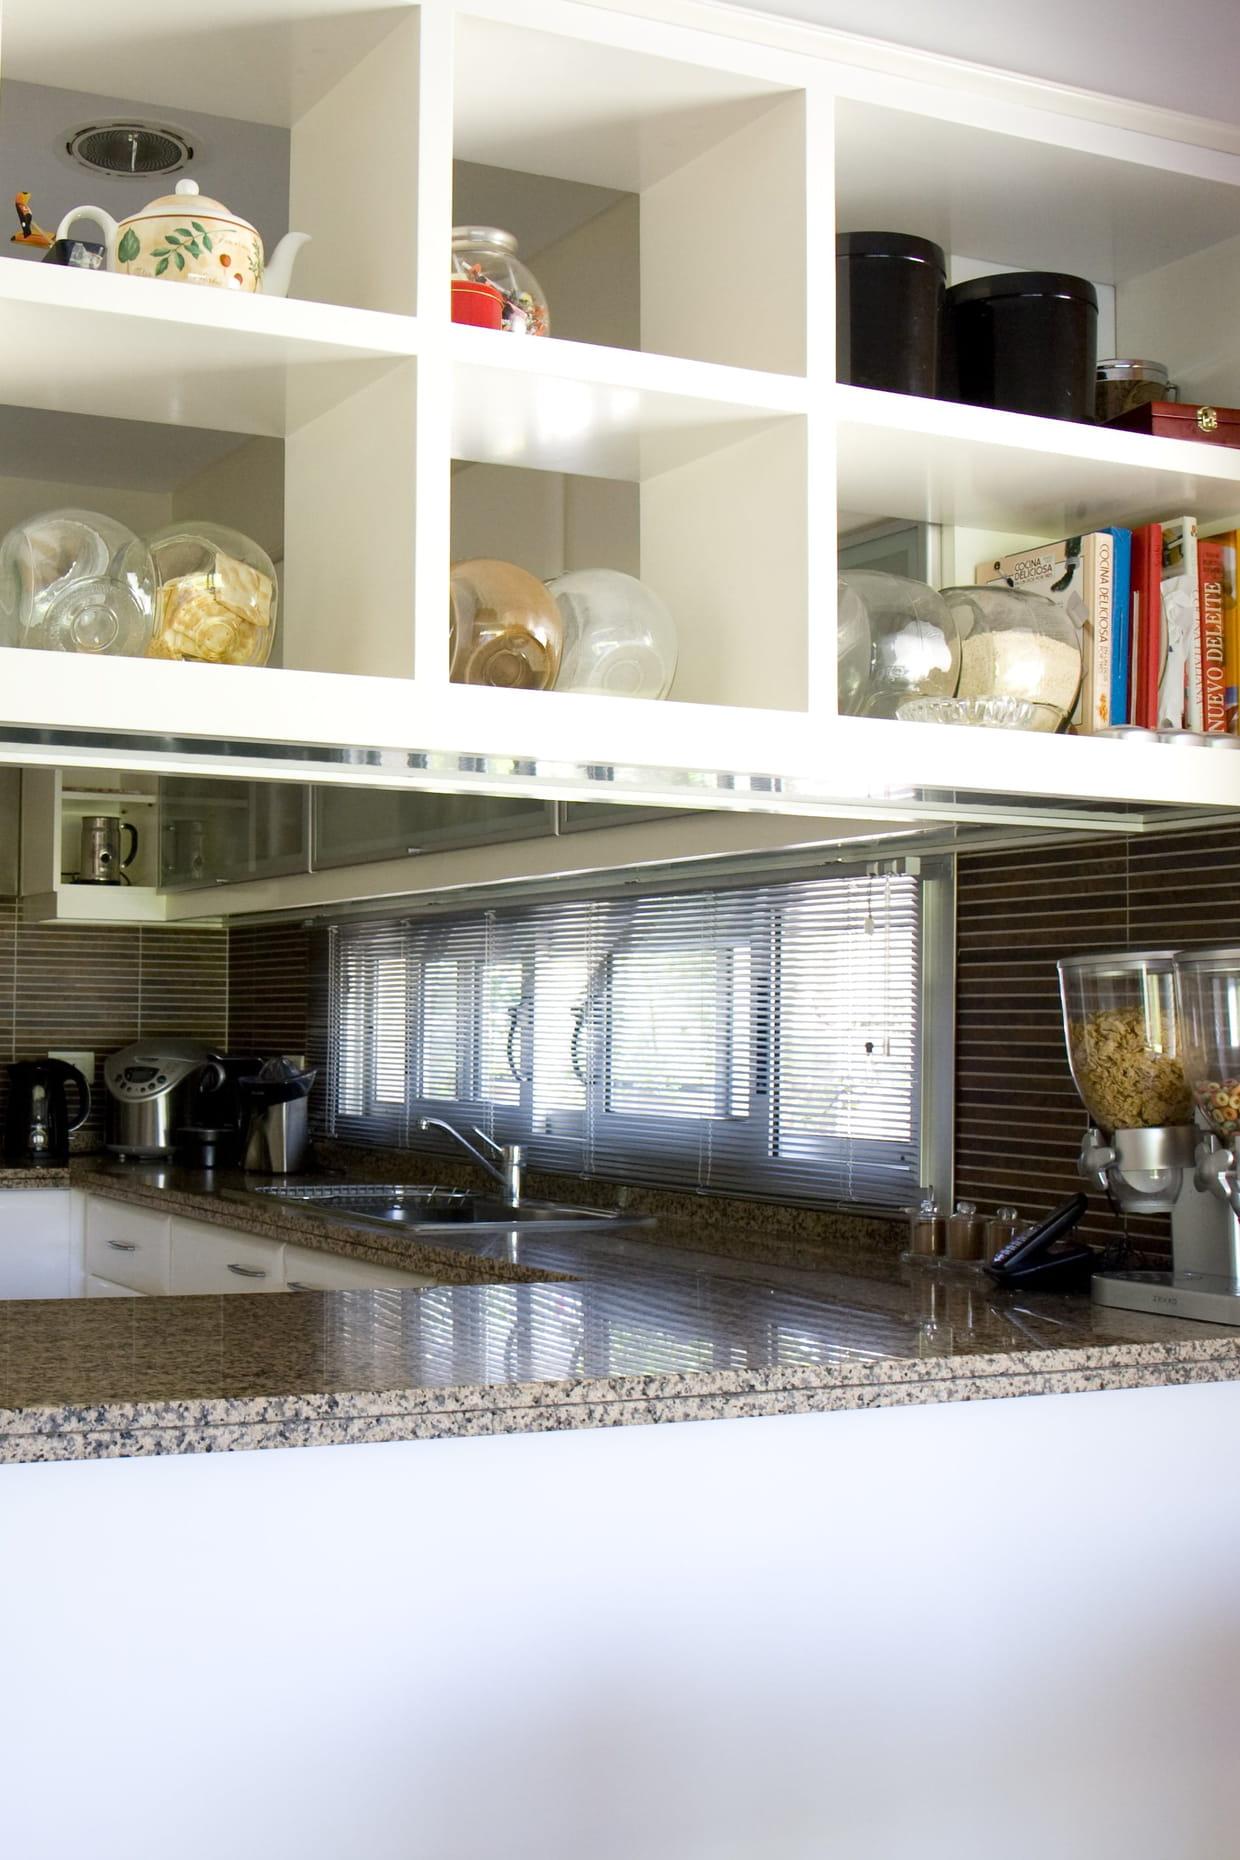 des casiers de rangement. Black Bedroom Furniture Sets. Home Design Ideas